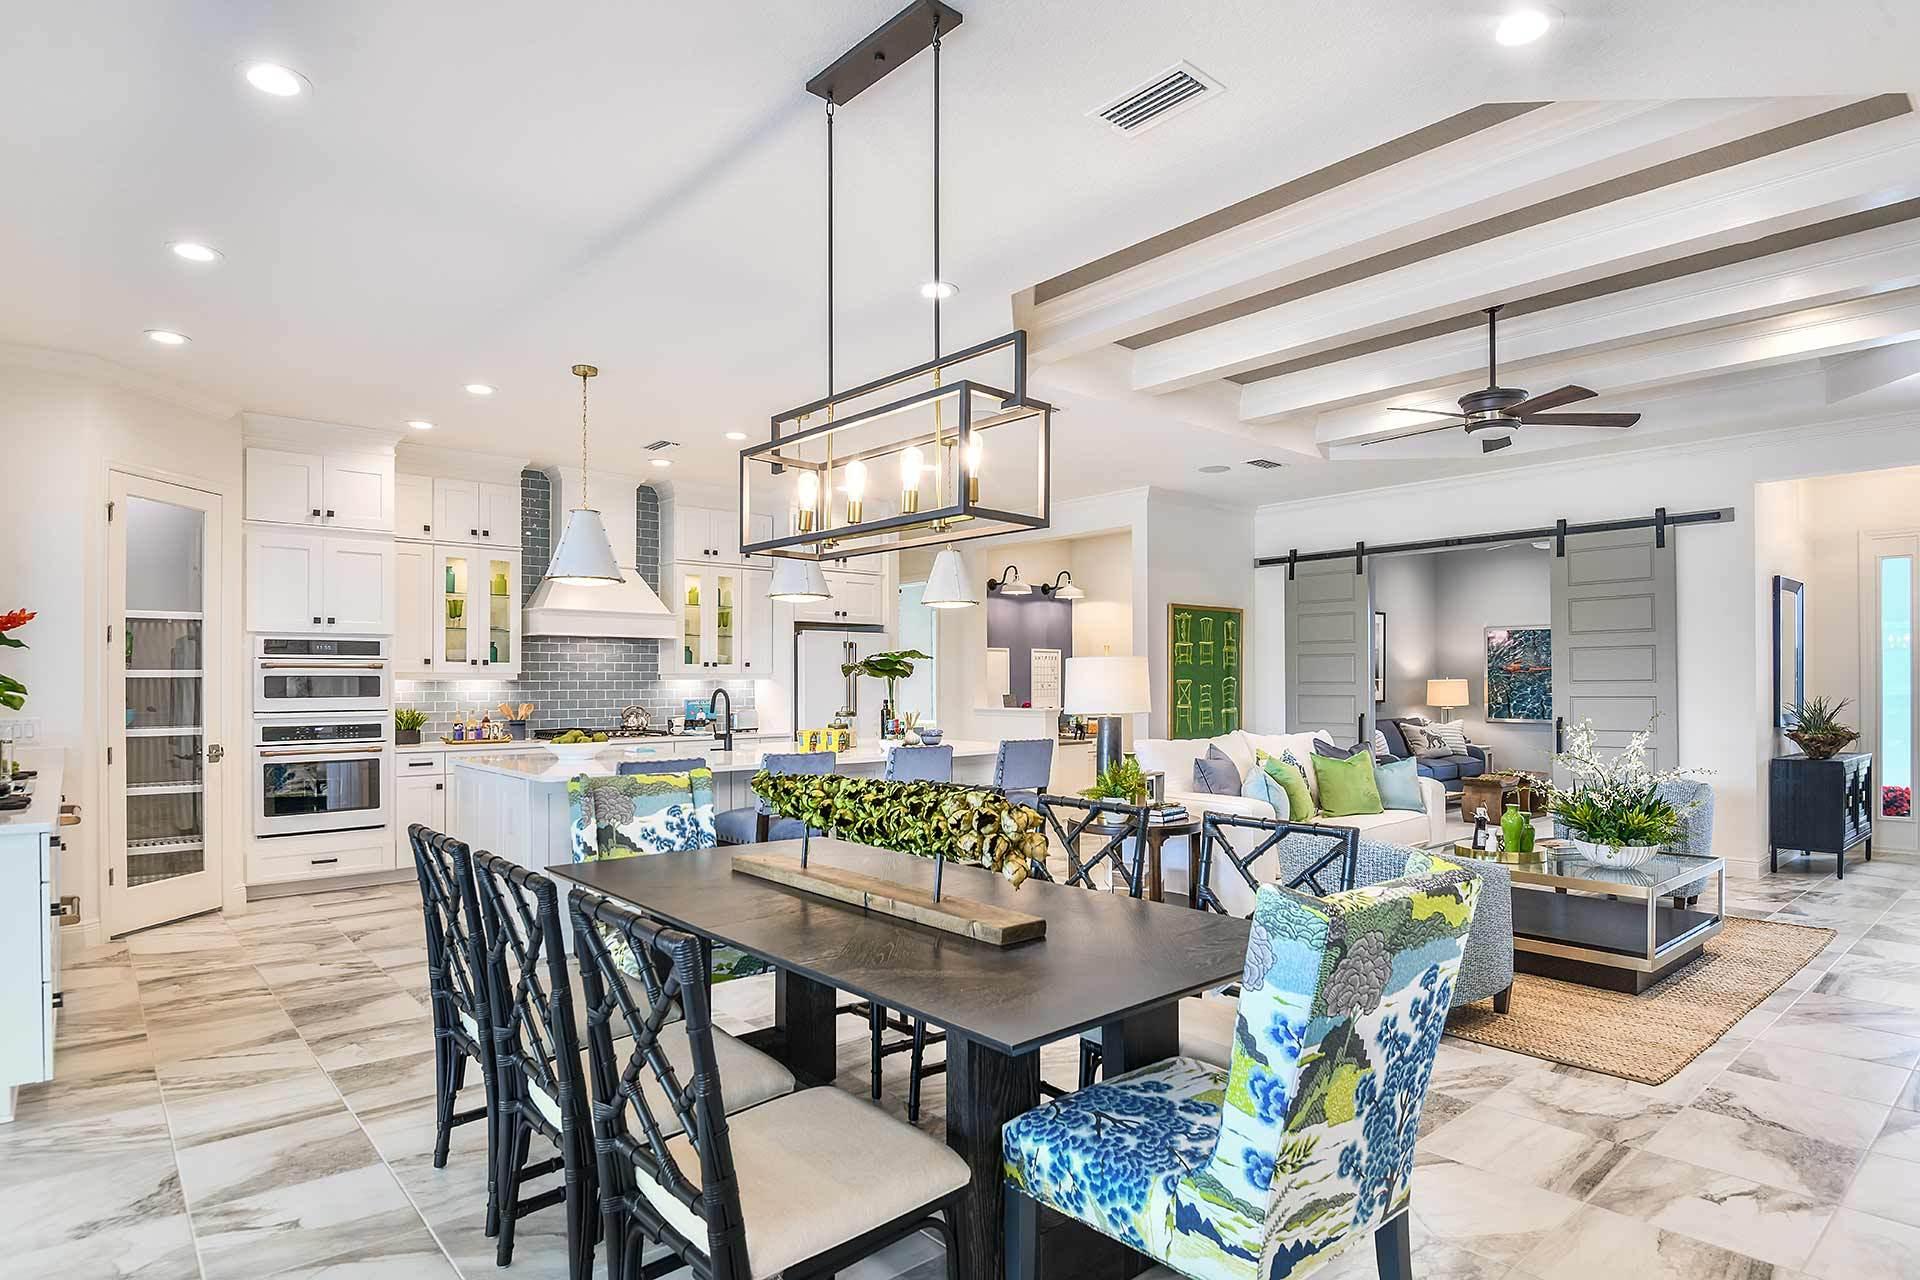 Kitchen featured in the Savannah 2 By Neal Communities in Sarasota-Bradenton, FL